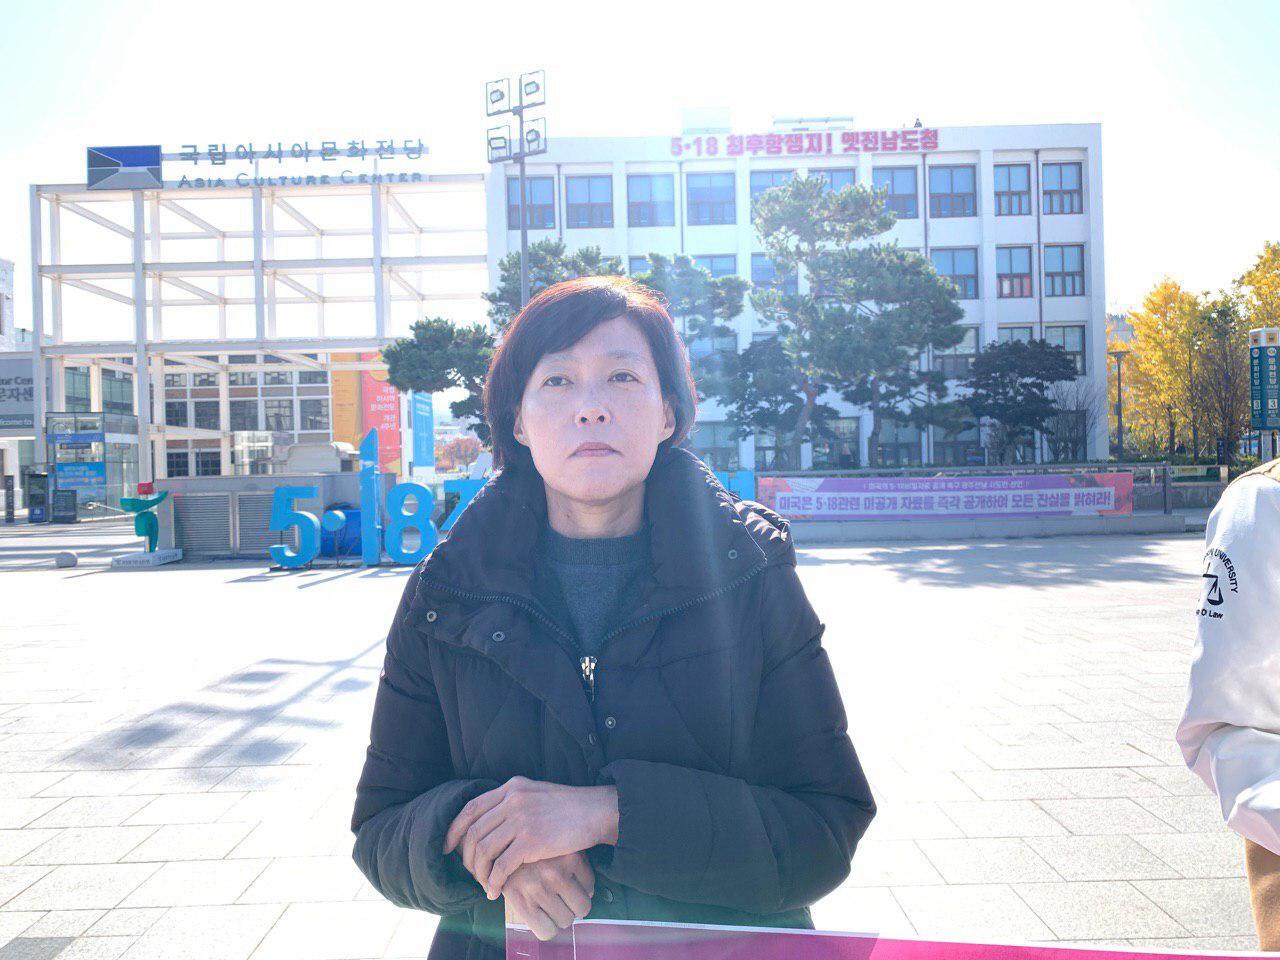 photo_2019-11-15_09-21-15.jpg